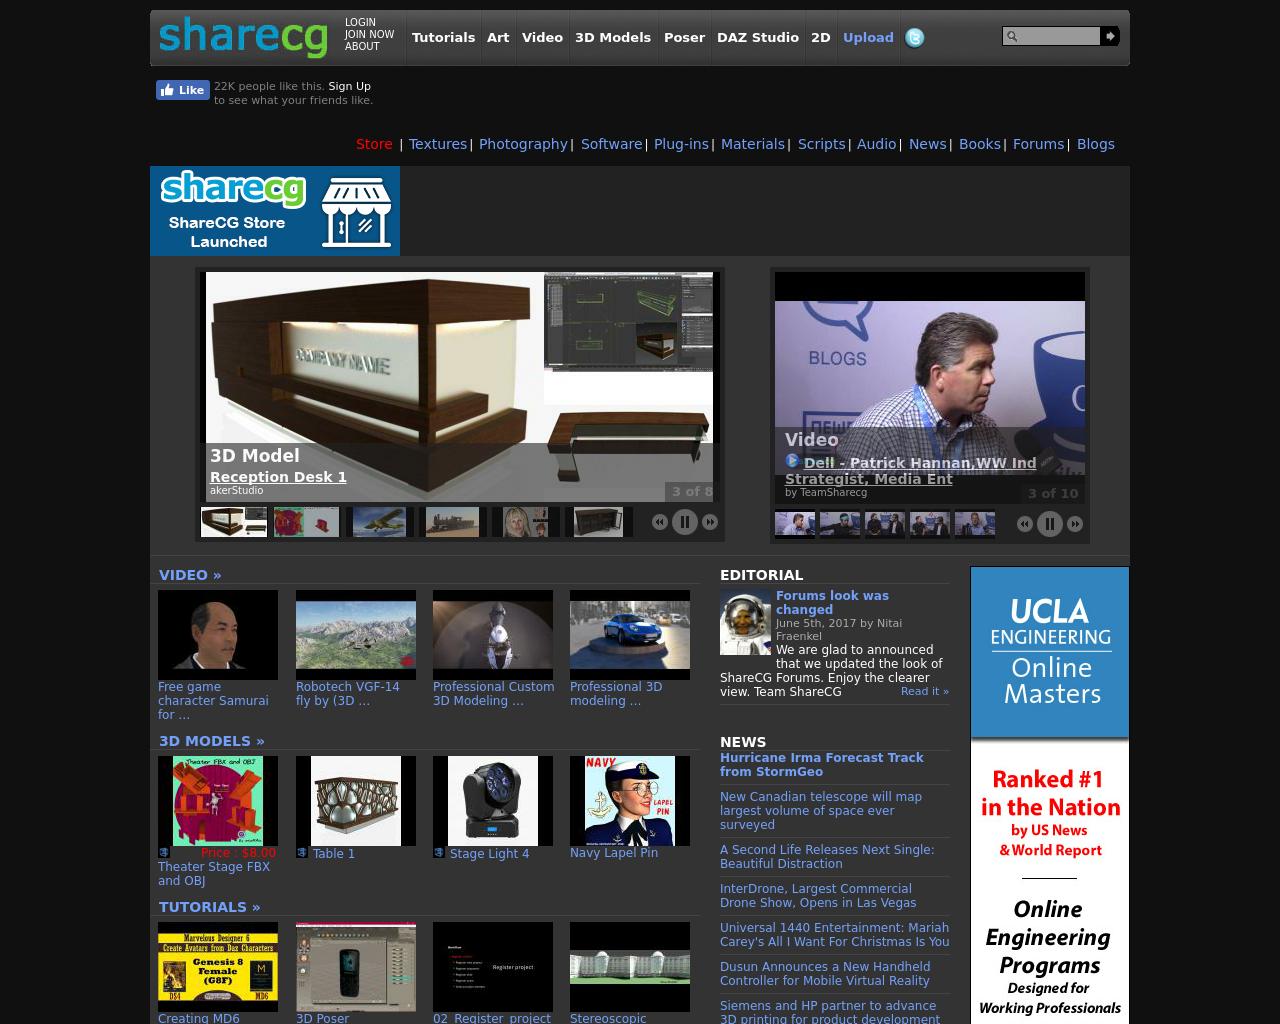 Sharecg-Advertising-Reviews-Pricing